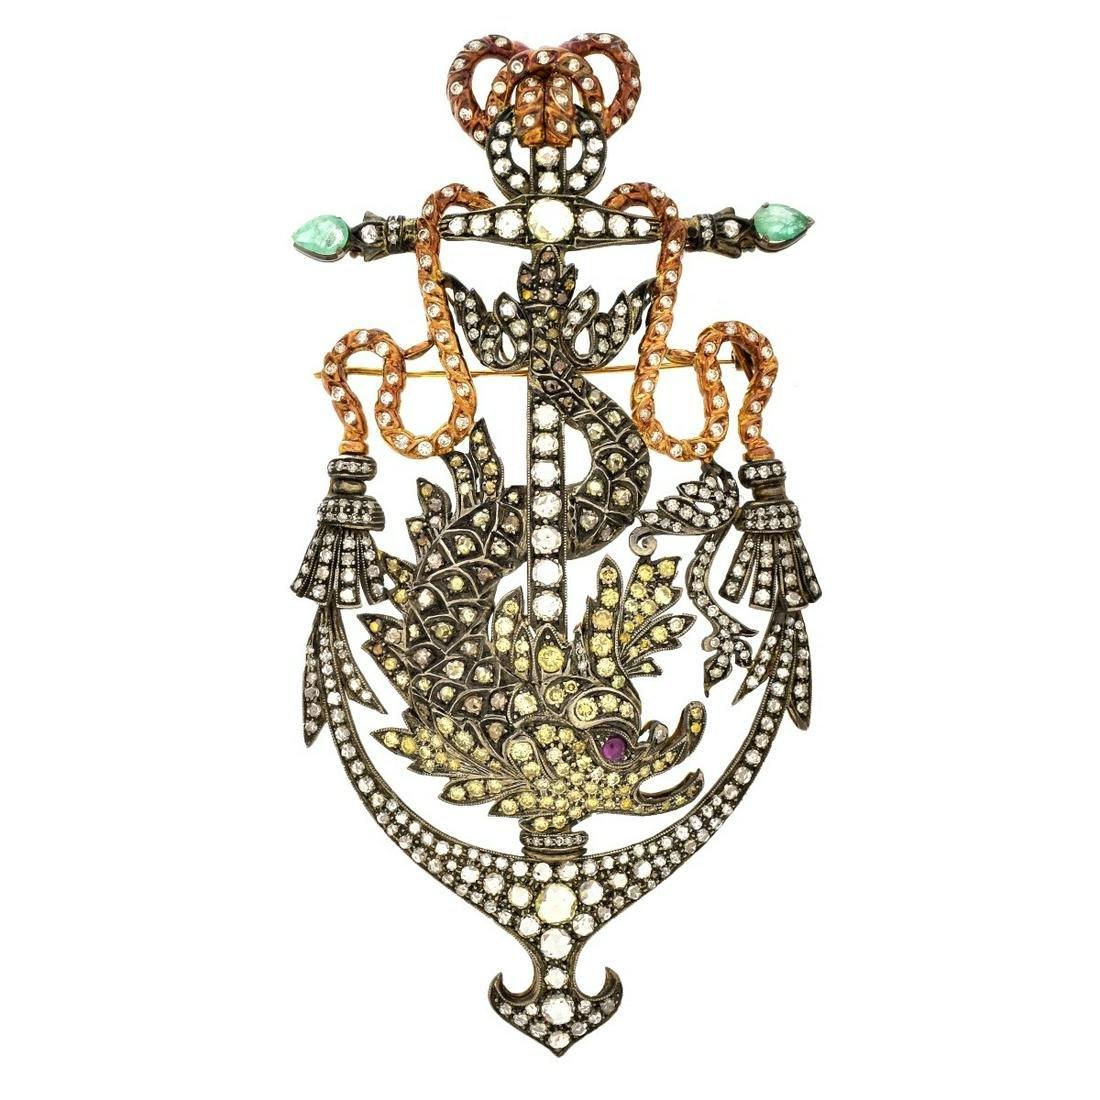 Antique Diamond and Gemstone Brooch